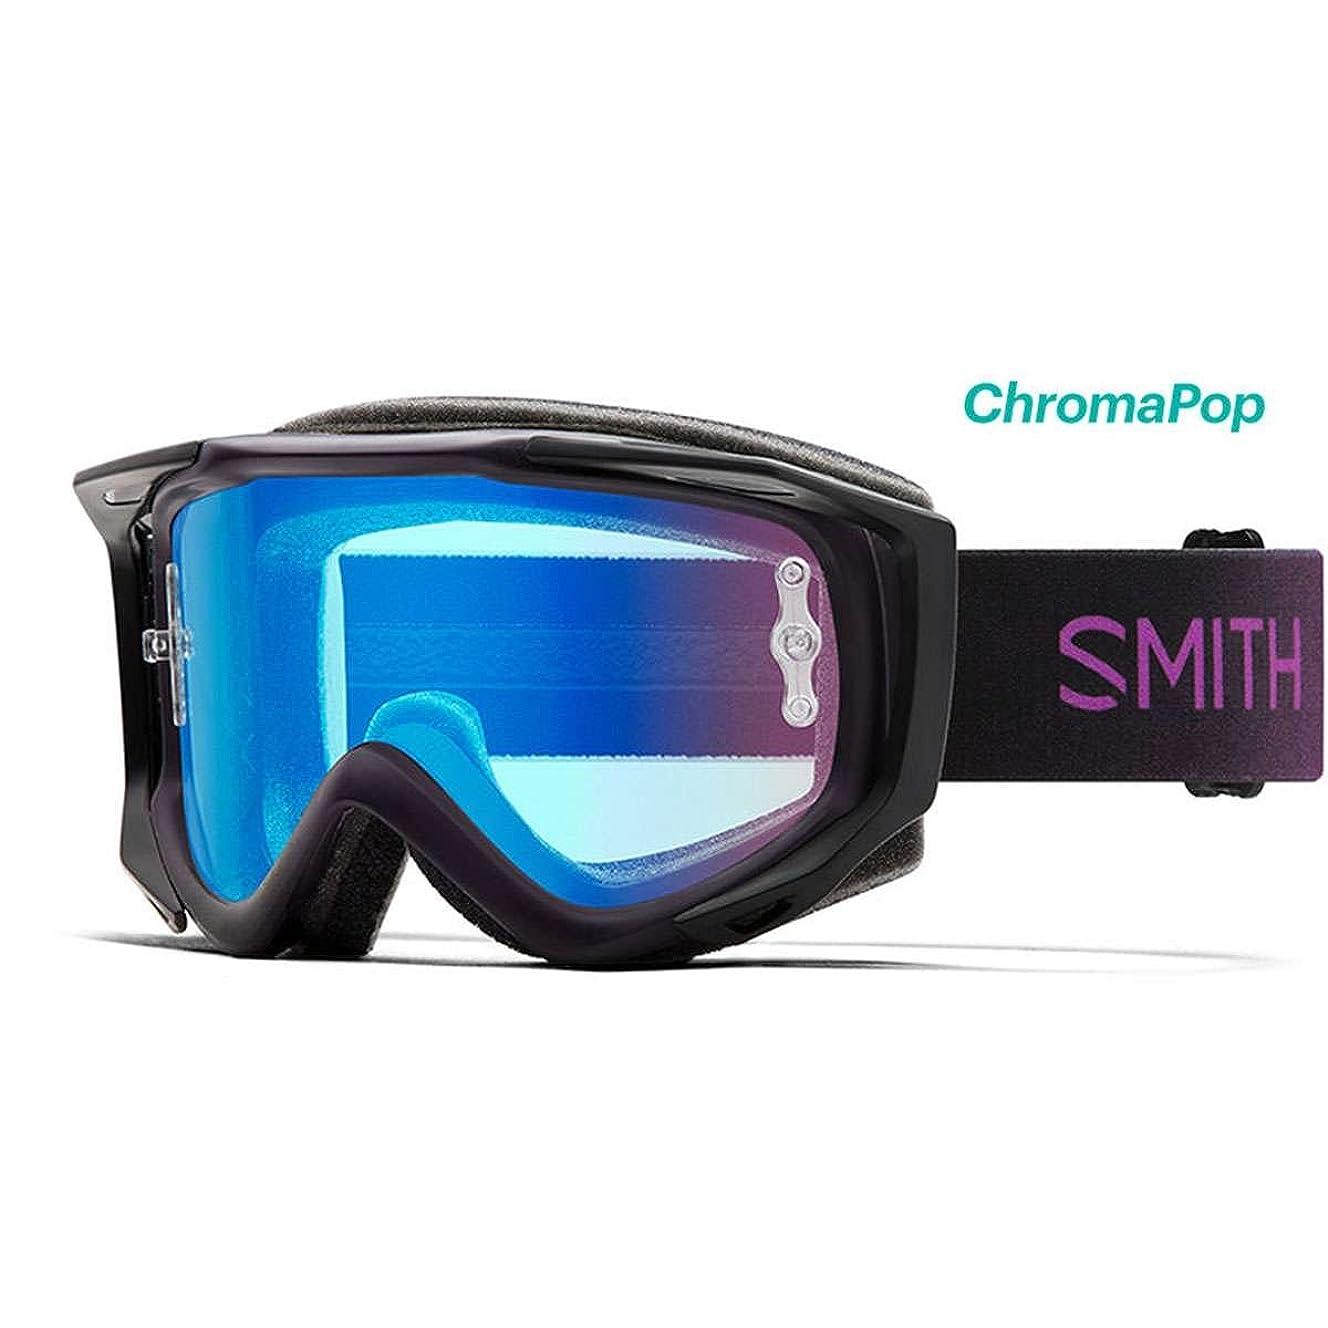 Smith Optics Fuel V2 Adult Off-Road Goggles - Violet Burst/Chromapop Contrast Rose Flash/One Size